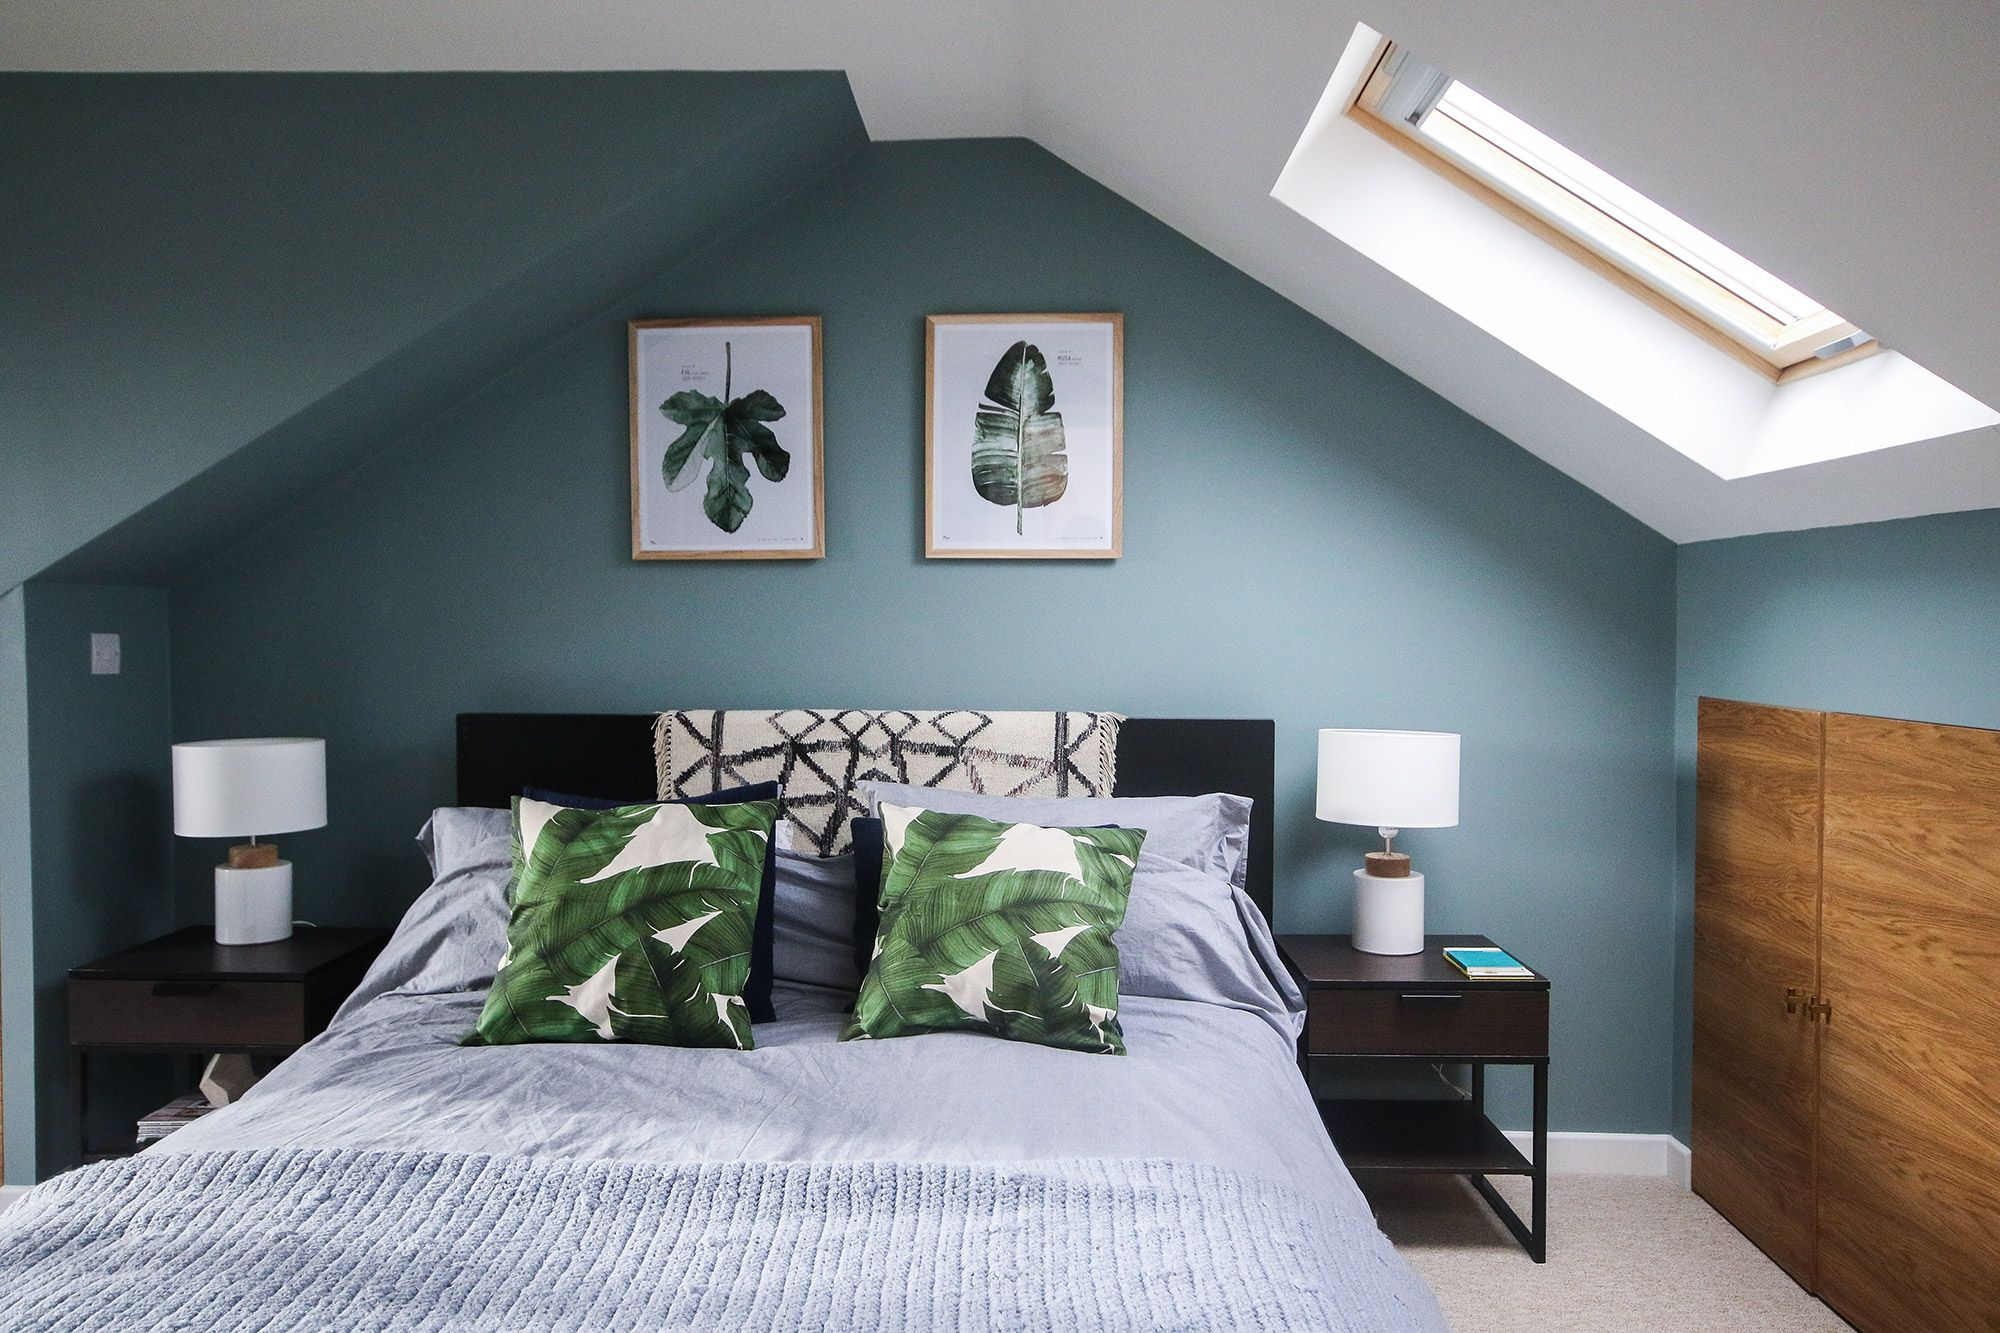 Farrow & Ball Oval Room Blue palm leaves calming loft bedroom